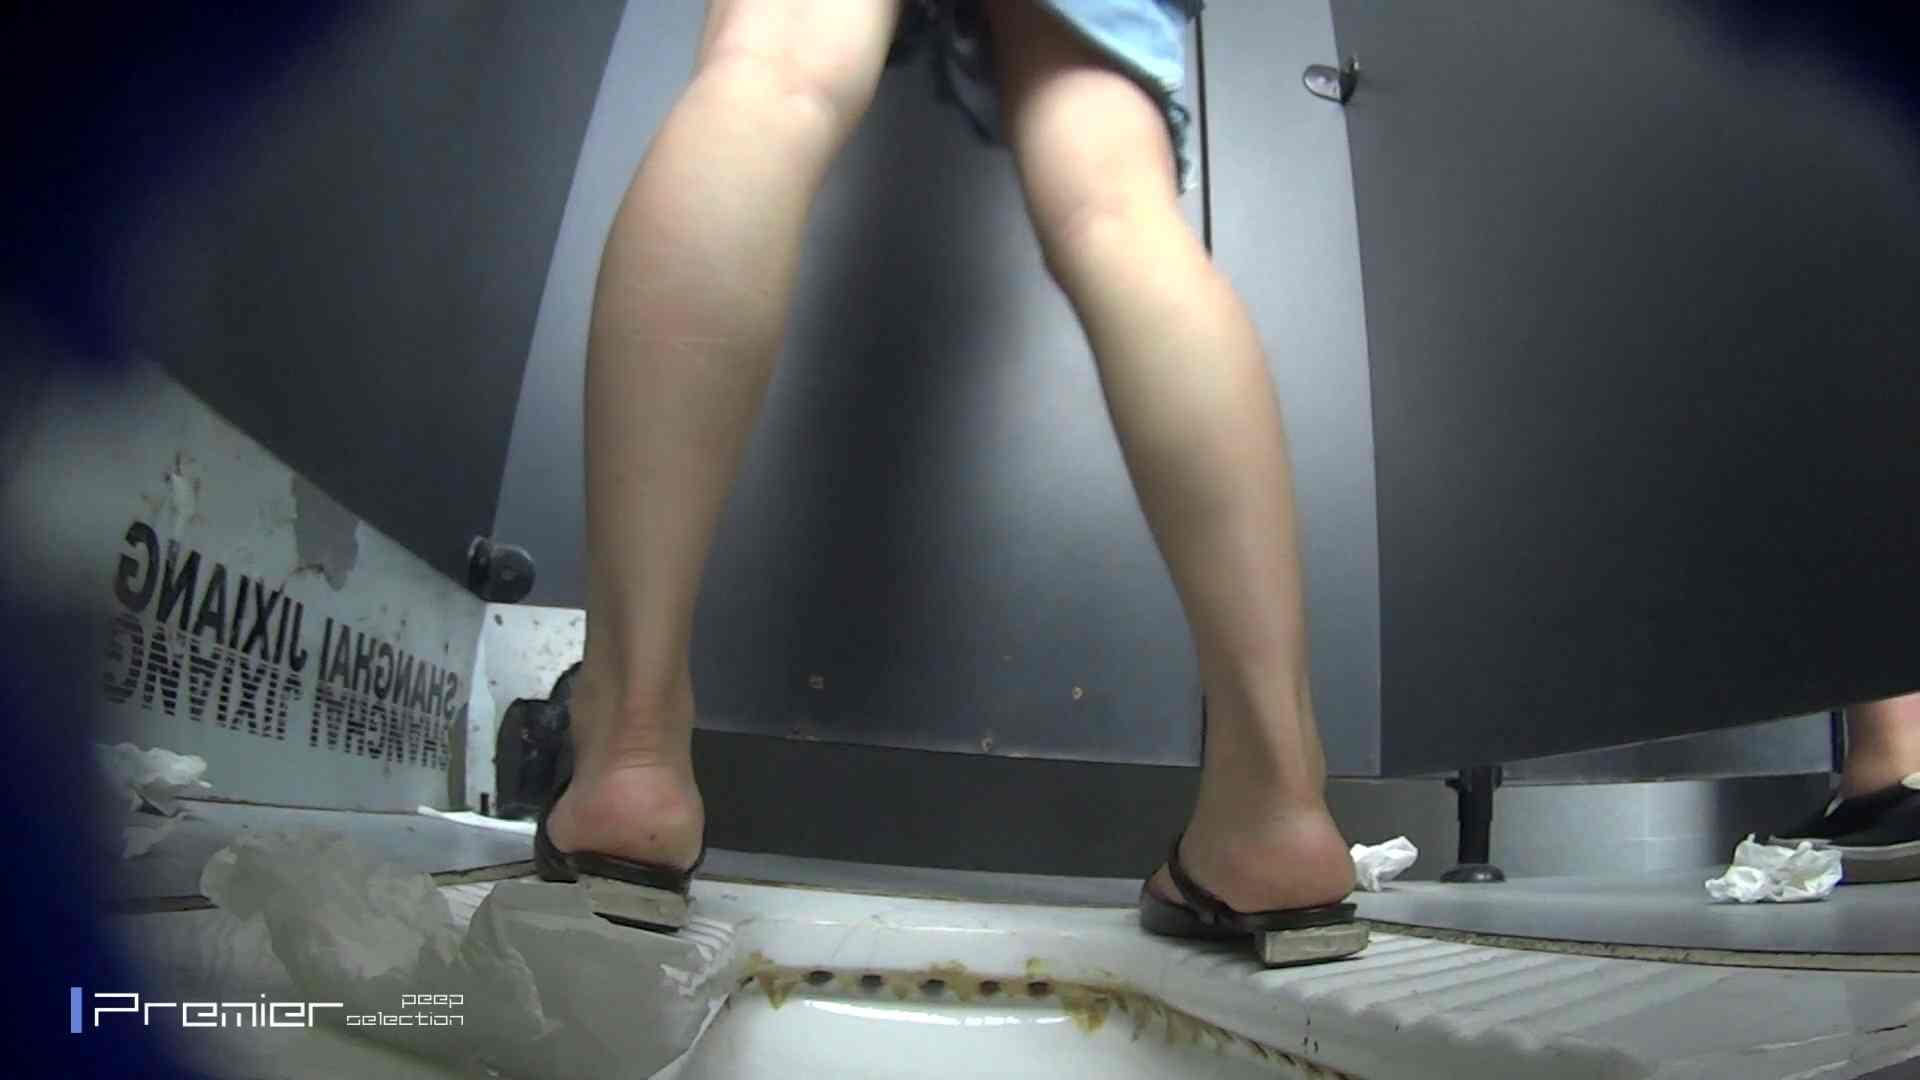 聖水ダラダラ色美女の洗面所 大学休憩時間の洗面所事情55 洗面所  55PIX 20